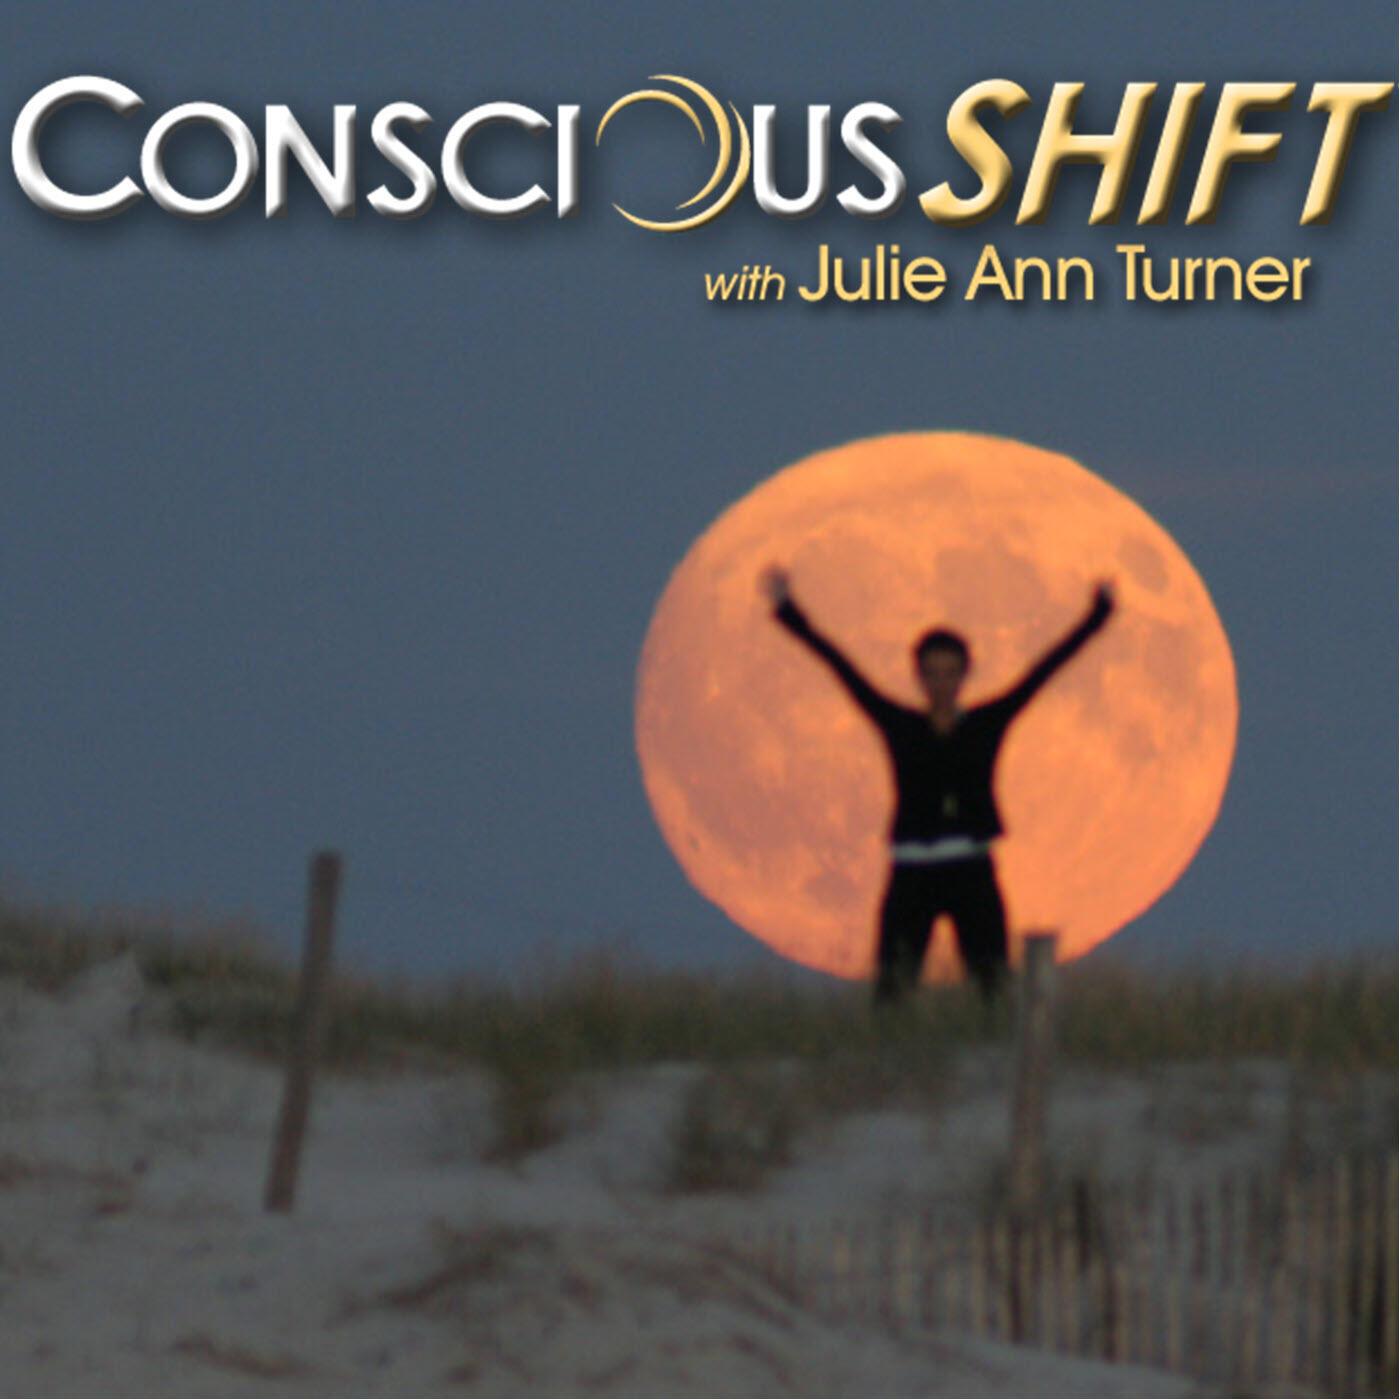 ConsciousSHIFT with Julie Ann Turner